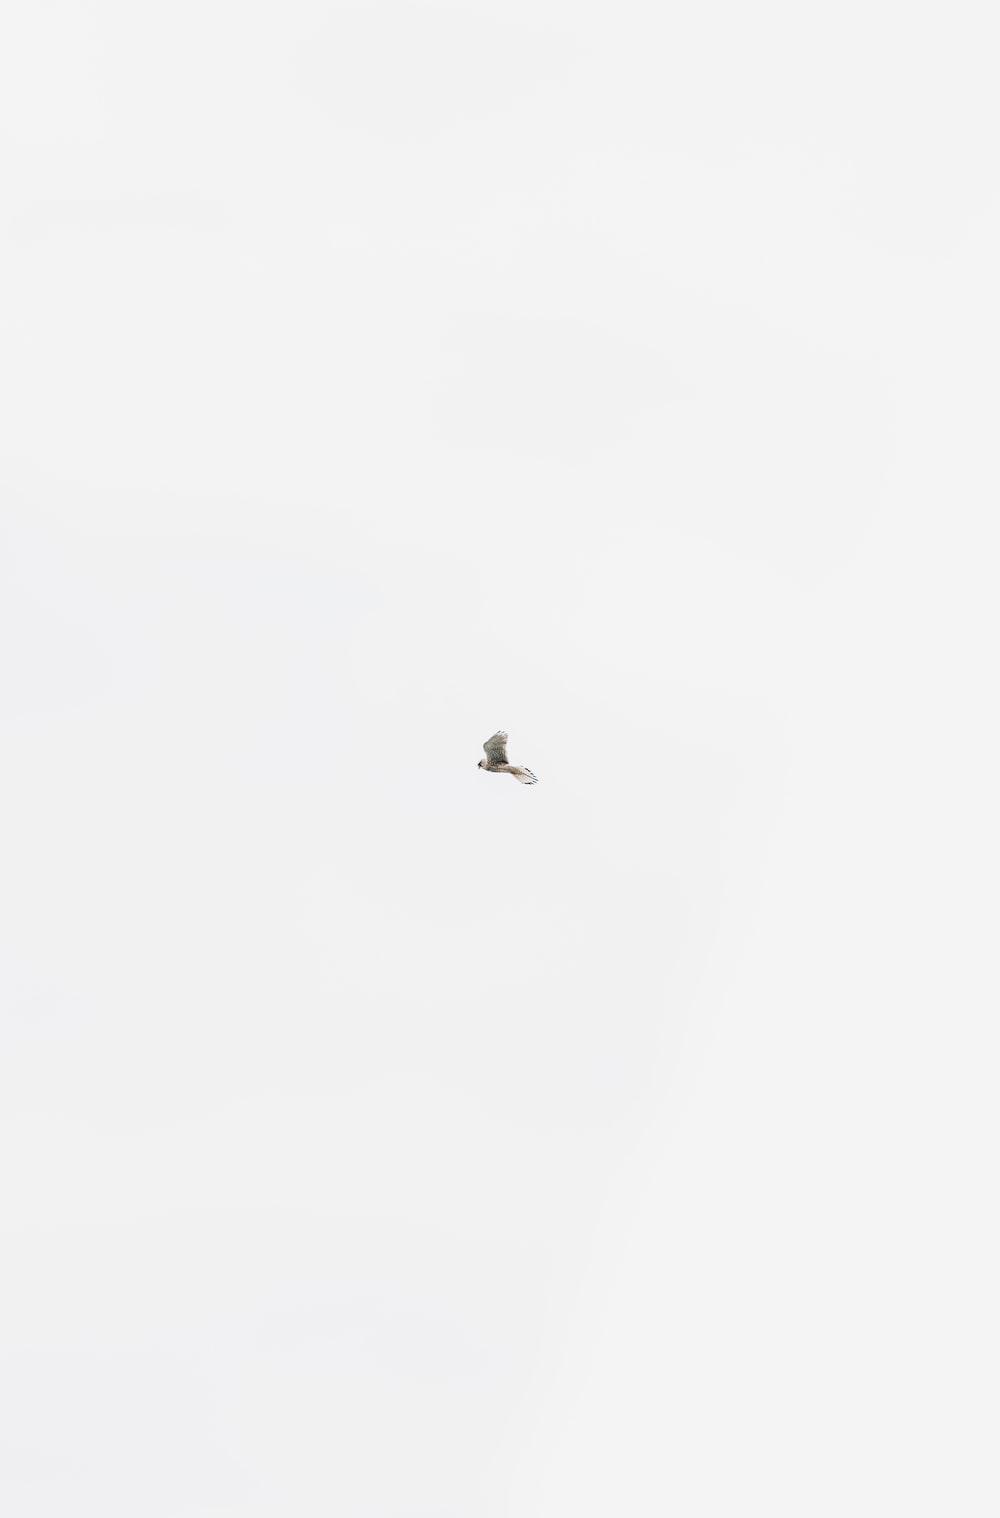 bird flying on mid air